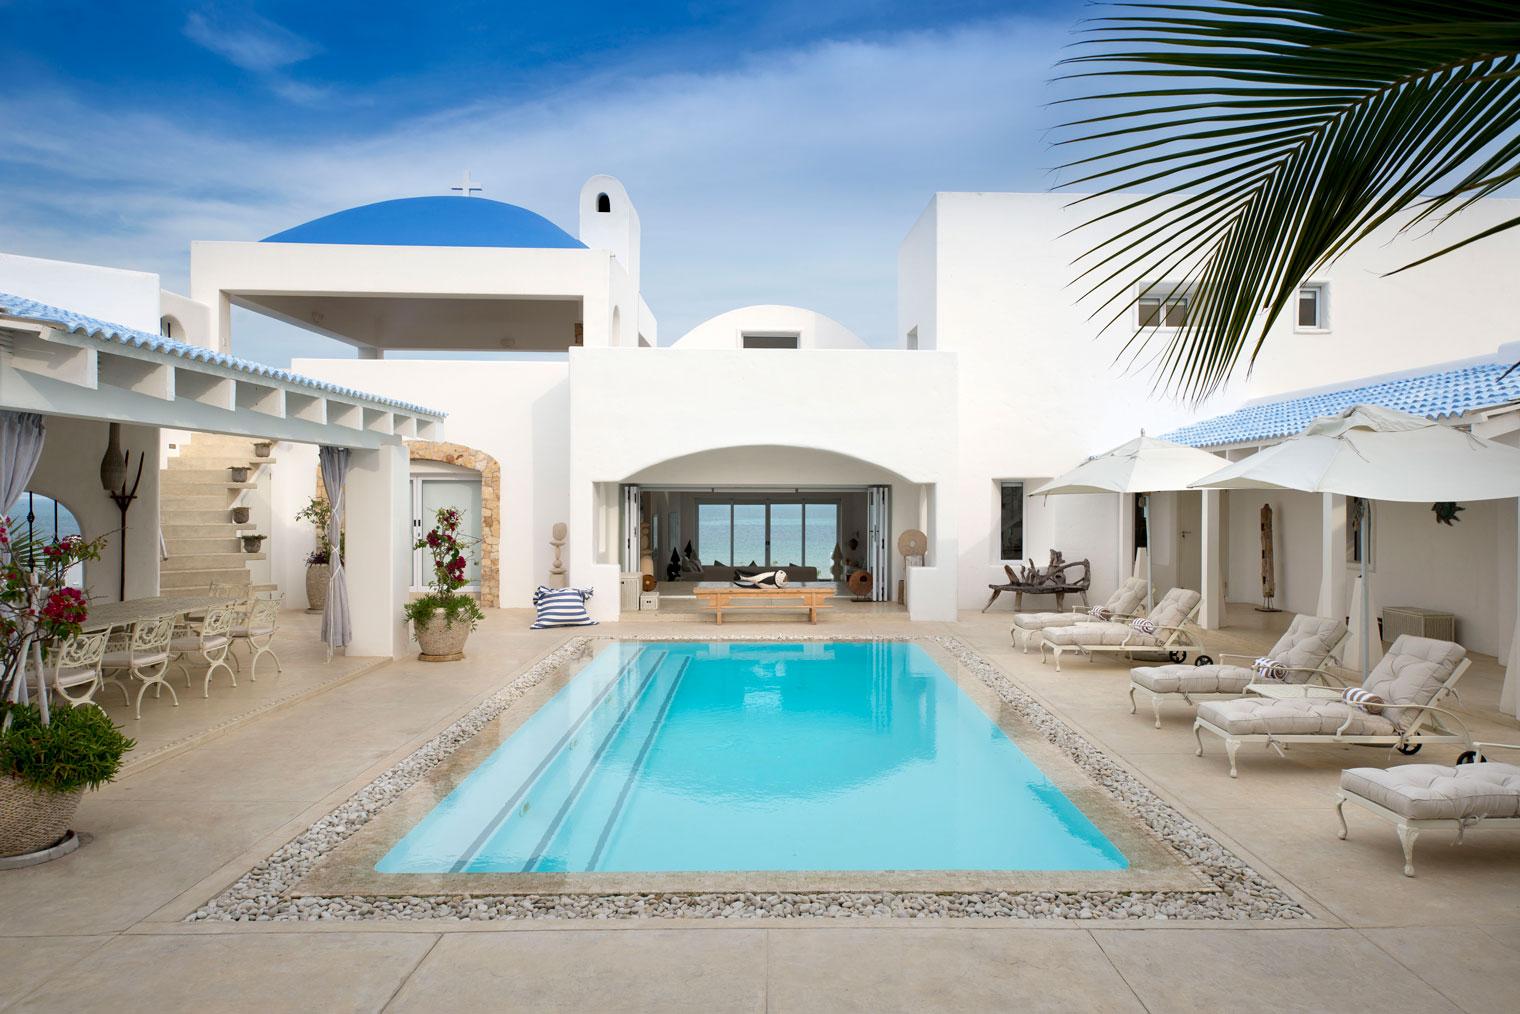 Santorini-Mozambique-Main-Pool-Area